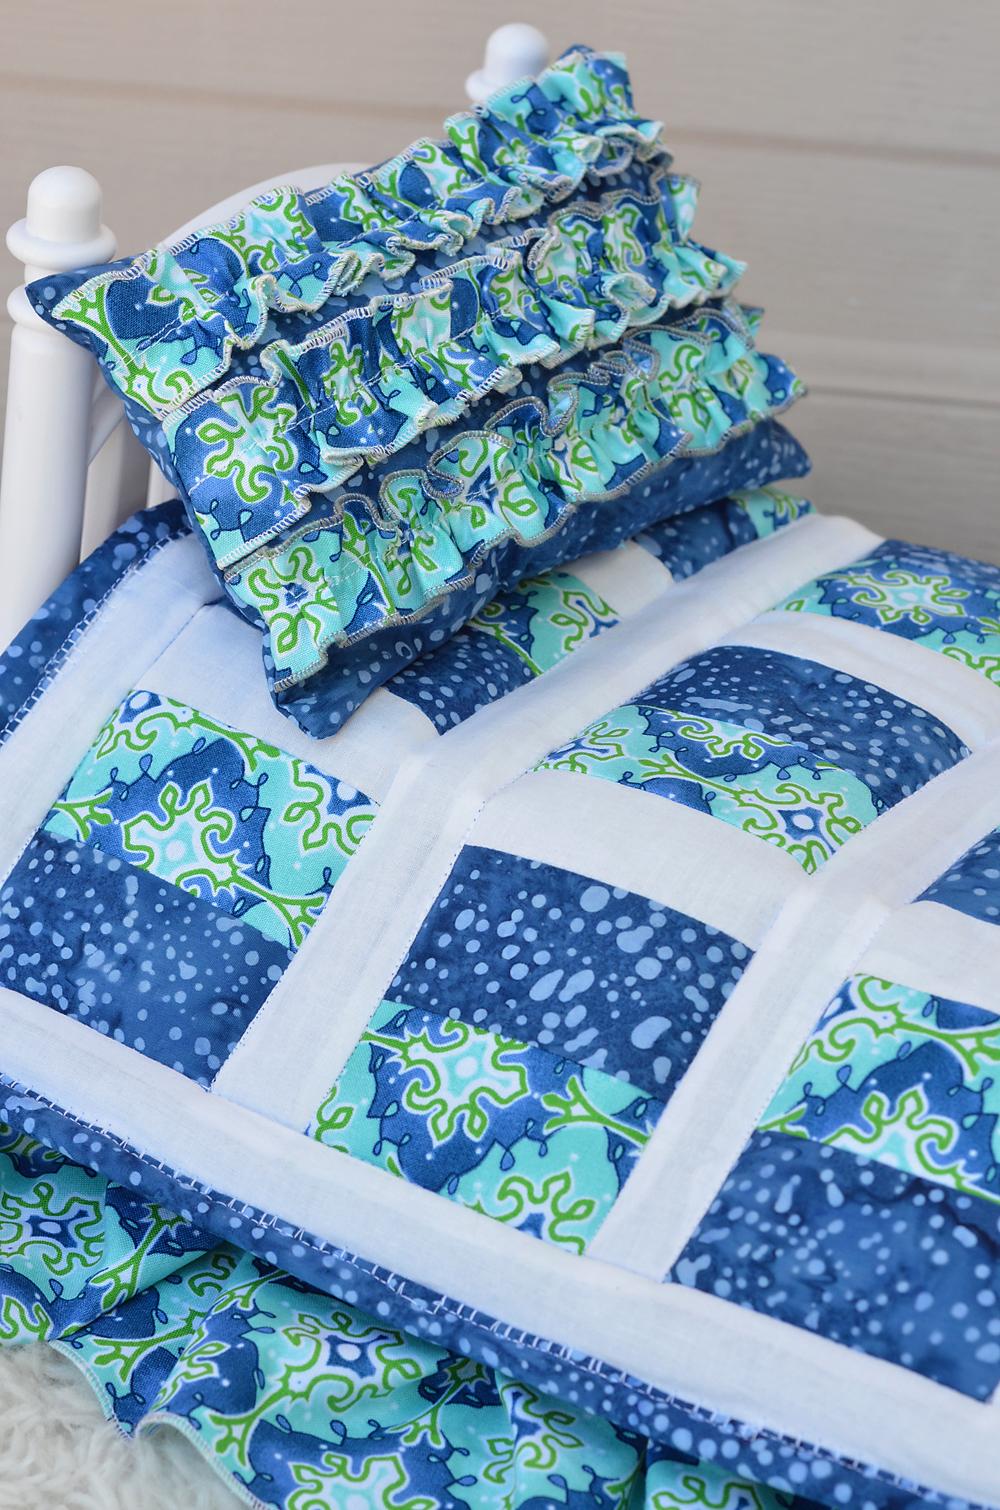 Isaiah's Incredible Quilt PDF Pattern